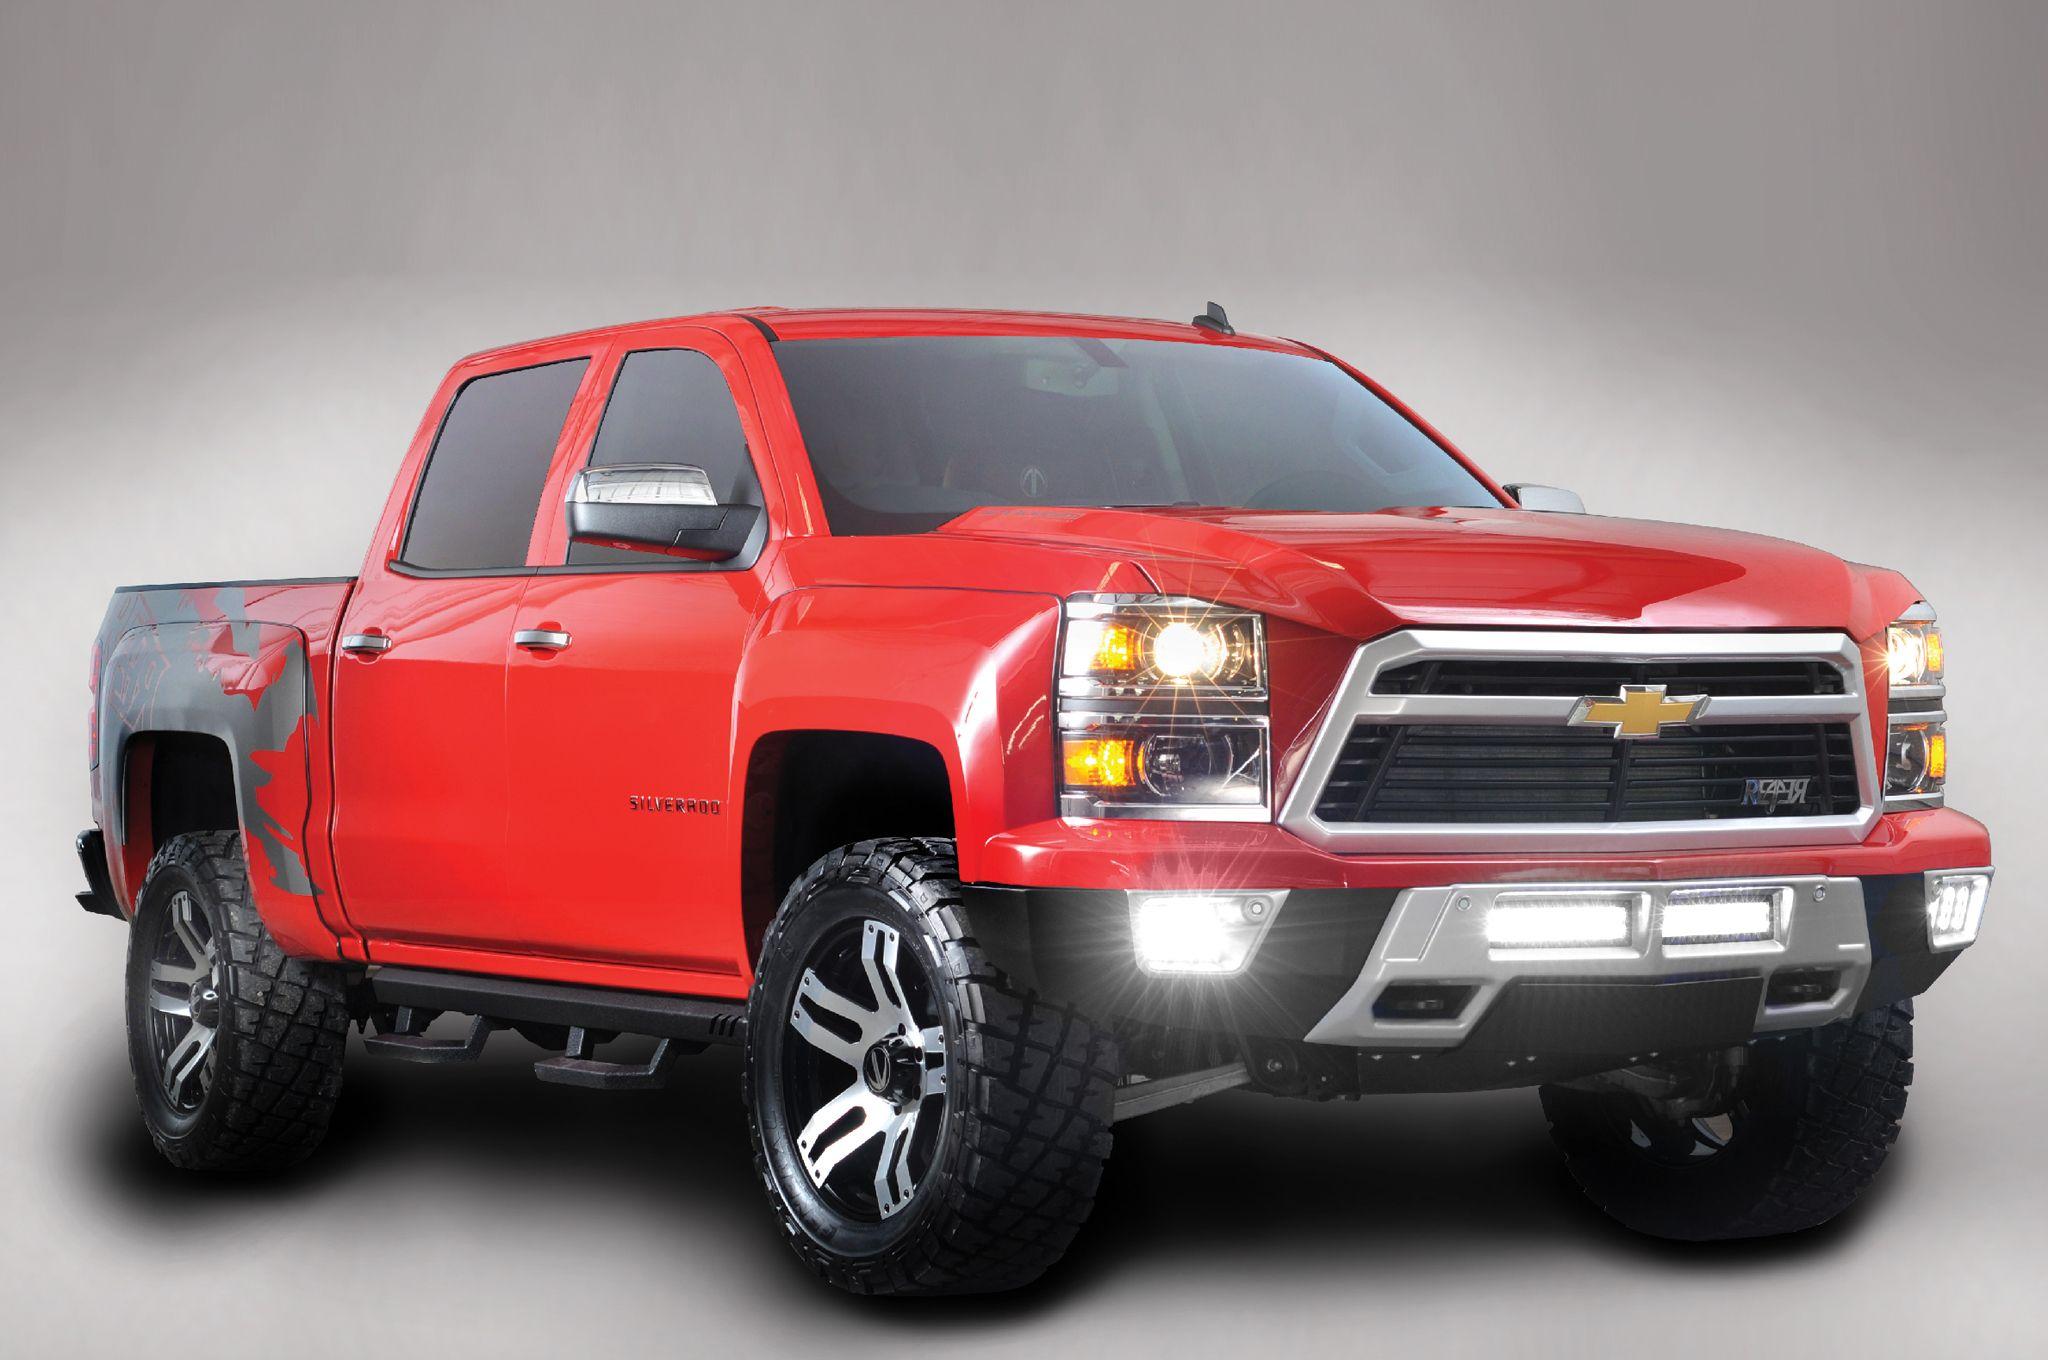 2015 Chevrolet Silverado 1500 6 2l 4x4 8 Speed Automatic Chevy Reaper Chevrolet Silverado Trucks